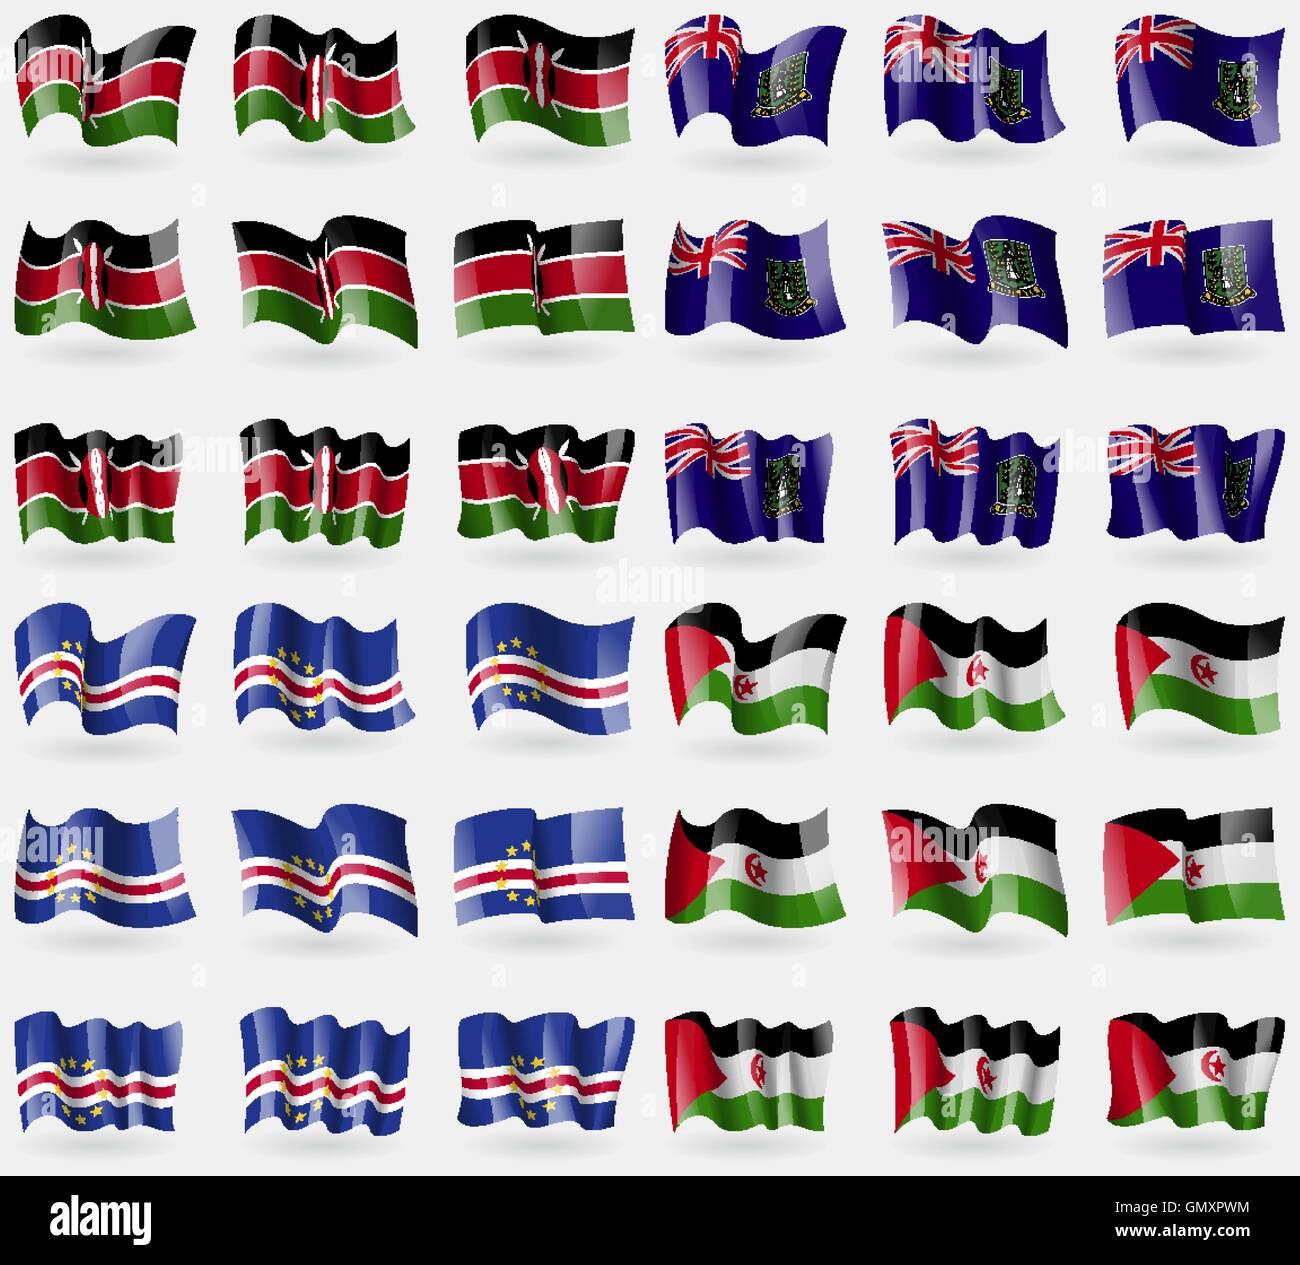 Kenya, VirginIslandsUK, Cape Verde, Western Sahara. Set of 36 flags of the countries of the world. Vector - Stock Image